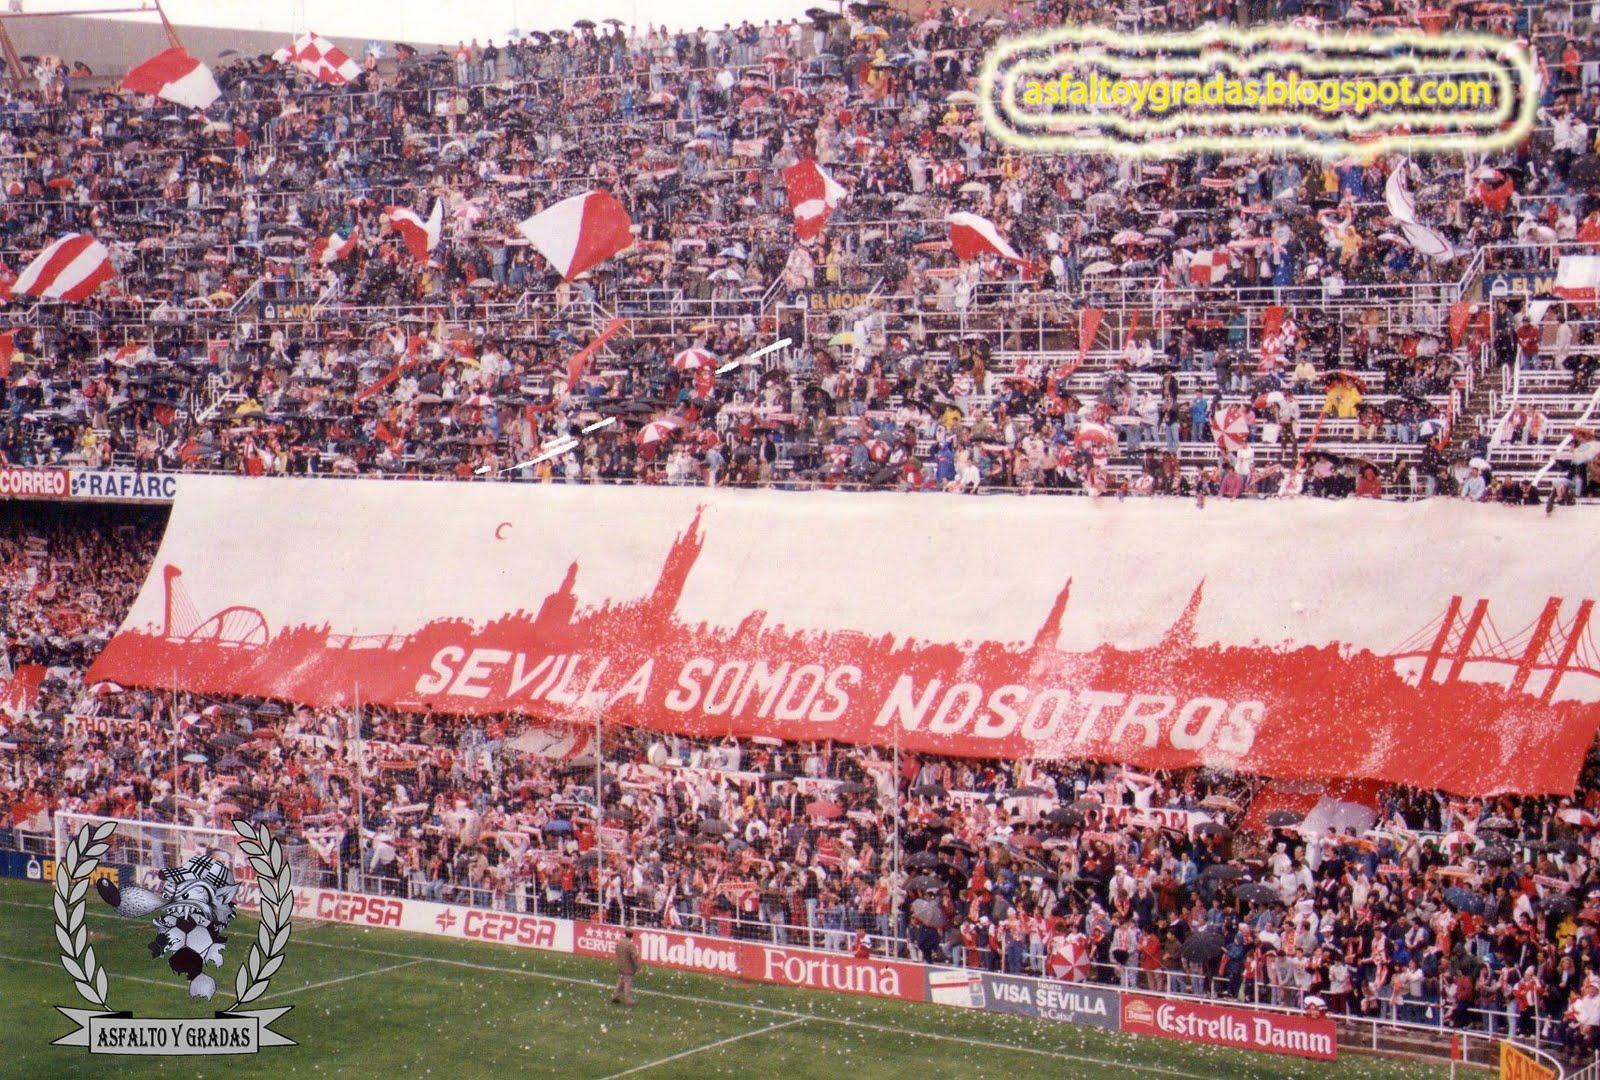 Sevilla FC Vs Real Betis B. 2 mayo de 2012. 20:00 Img092%2Bcopia